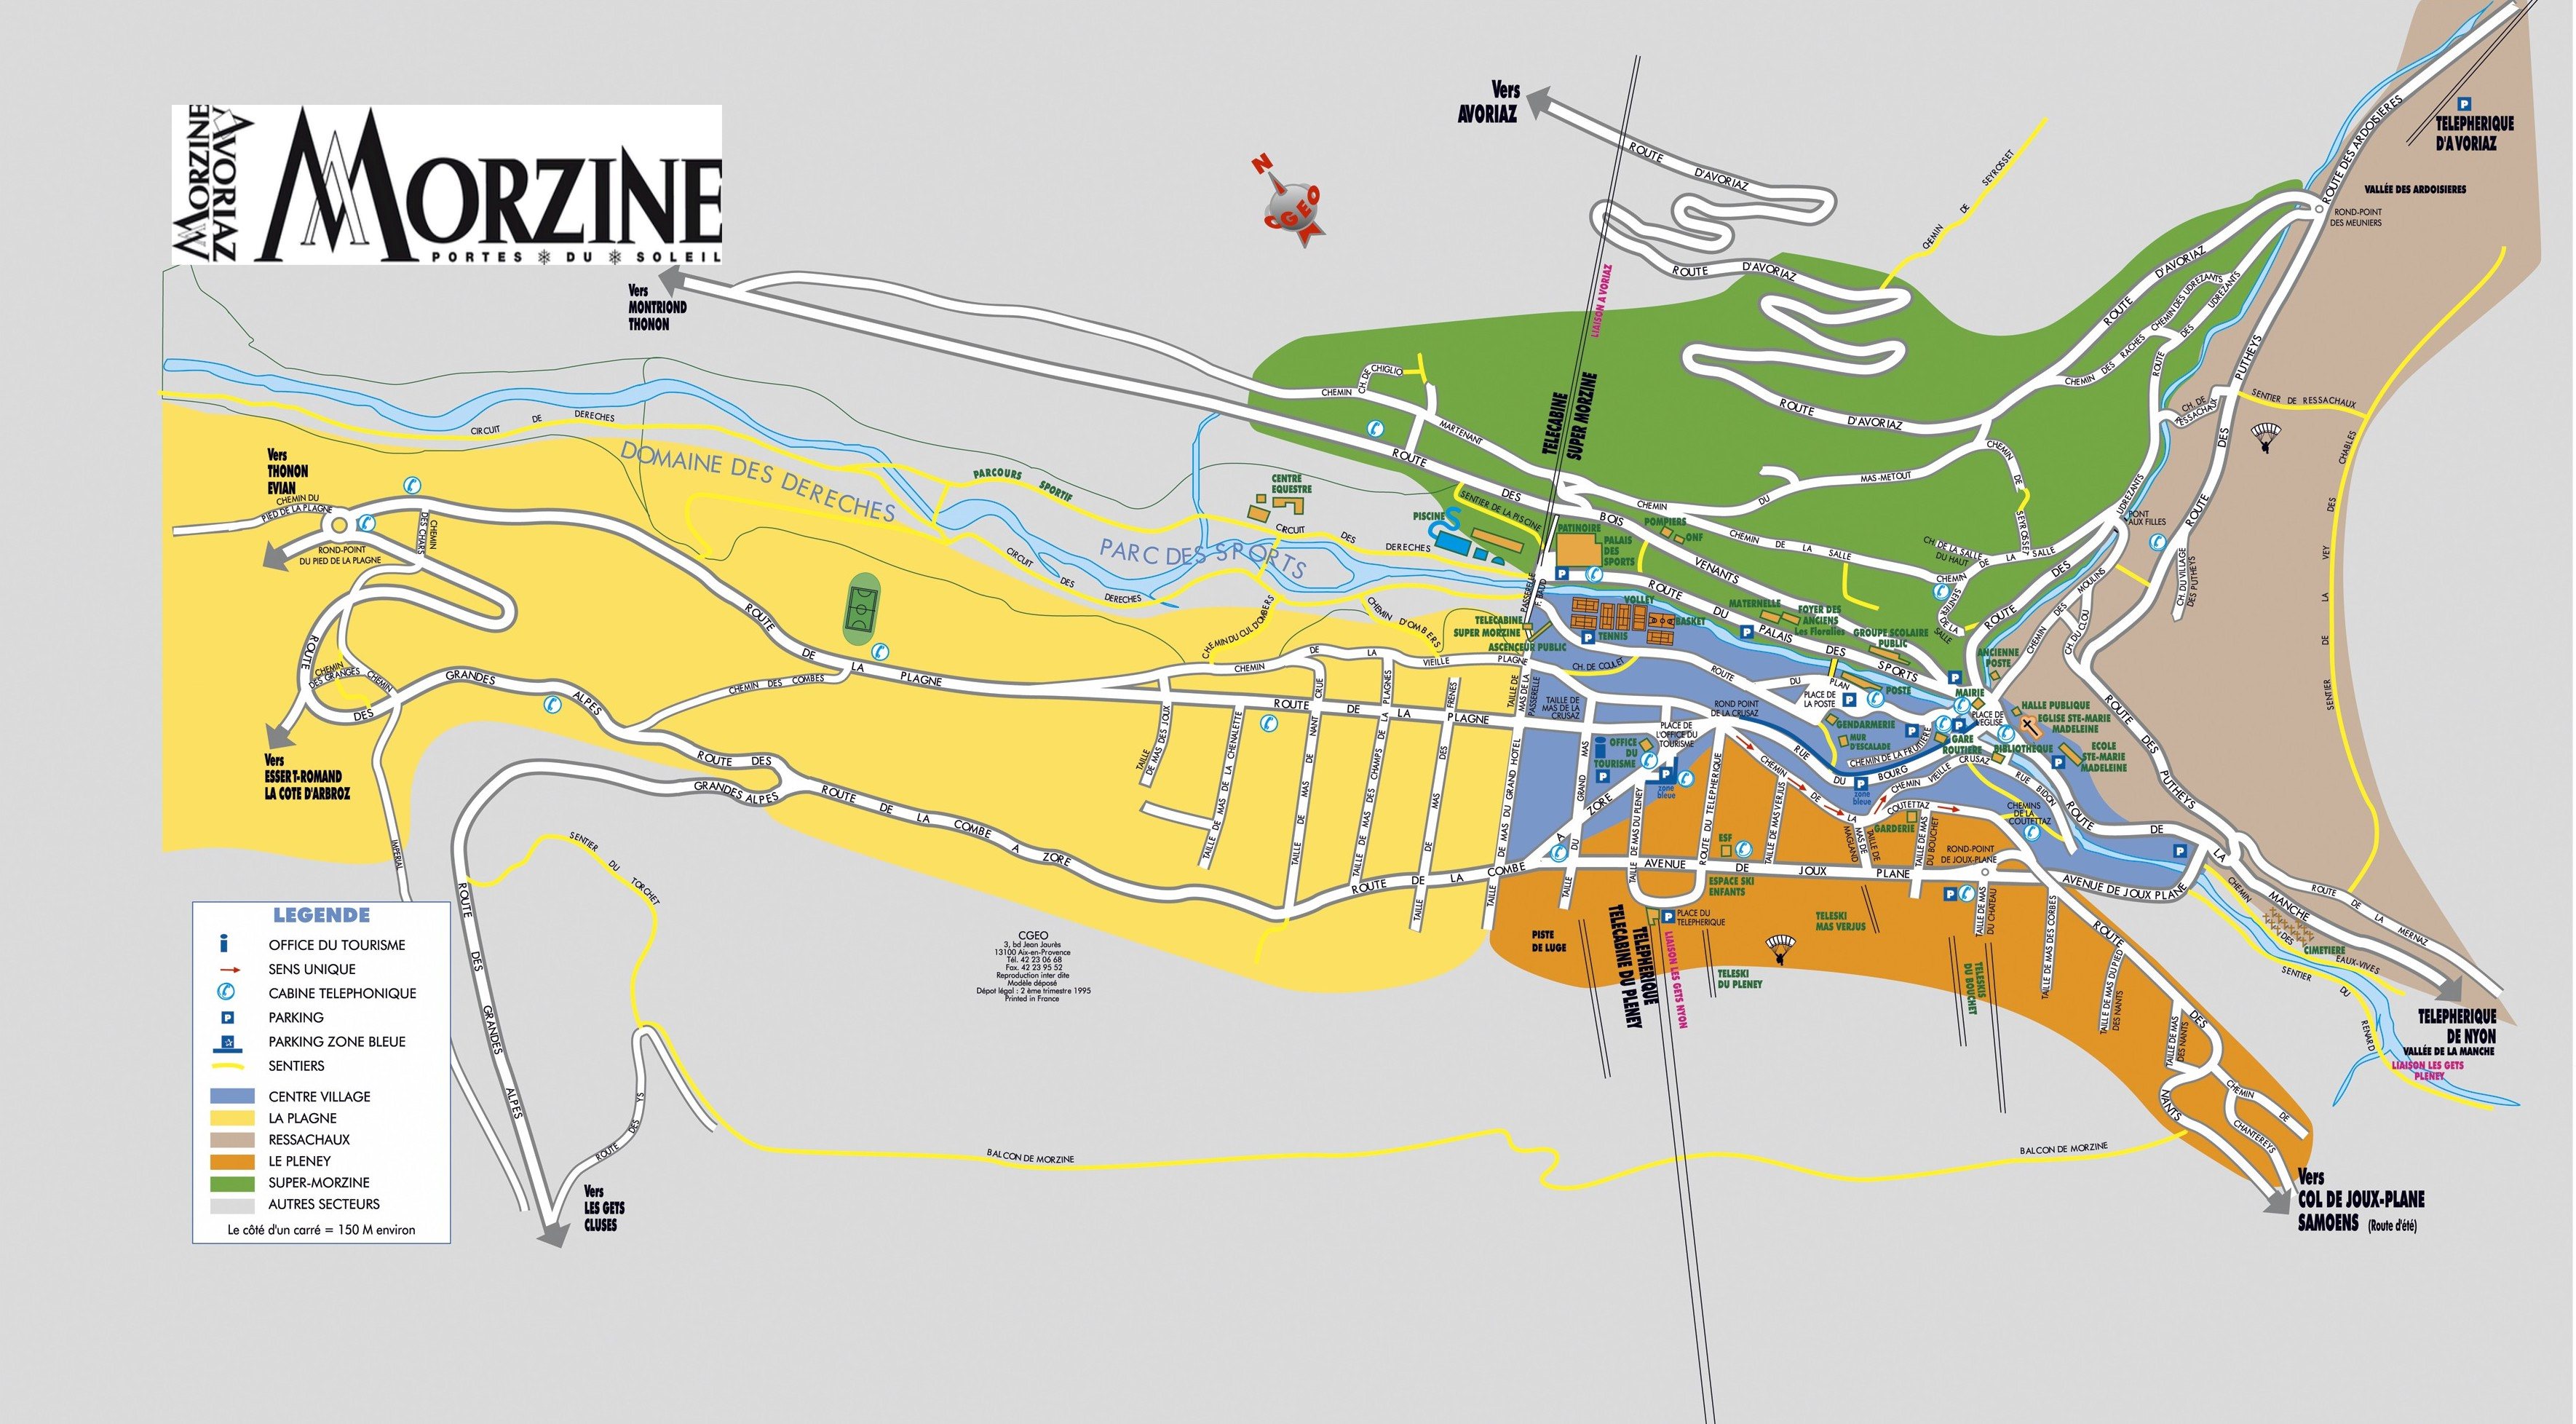 Plan d'accès Morzine